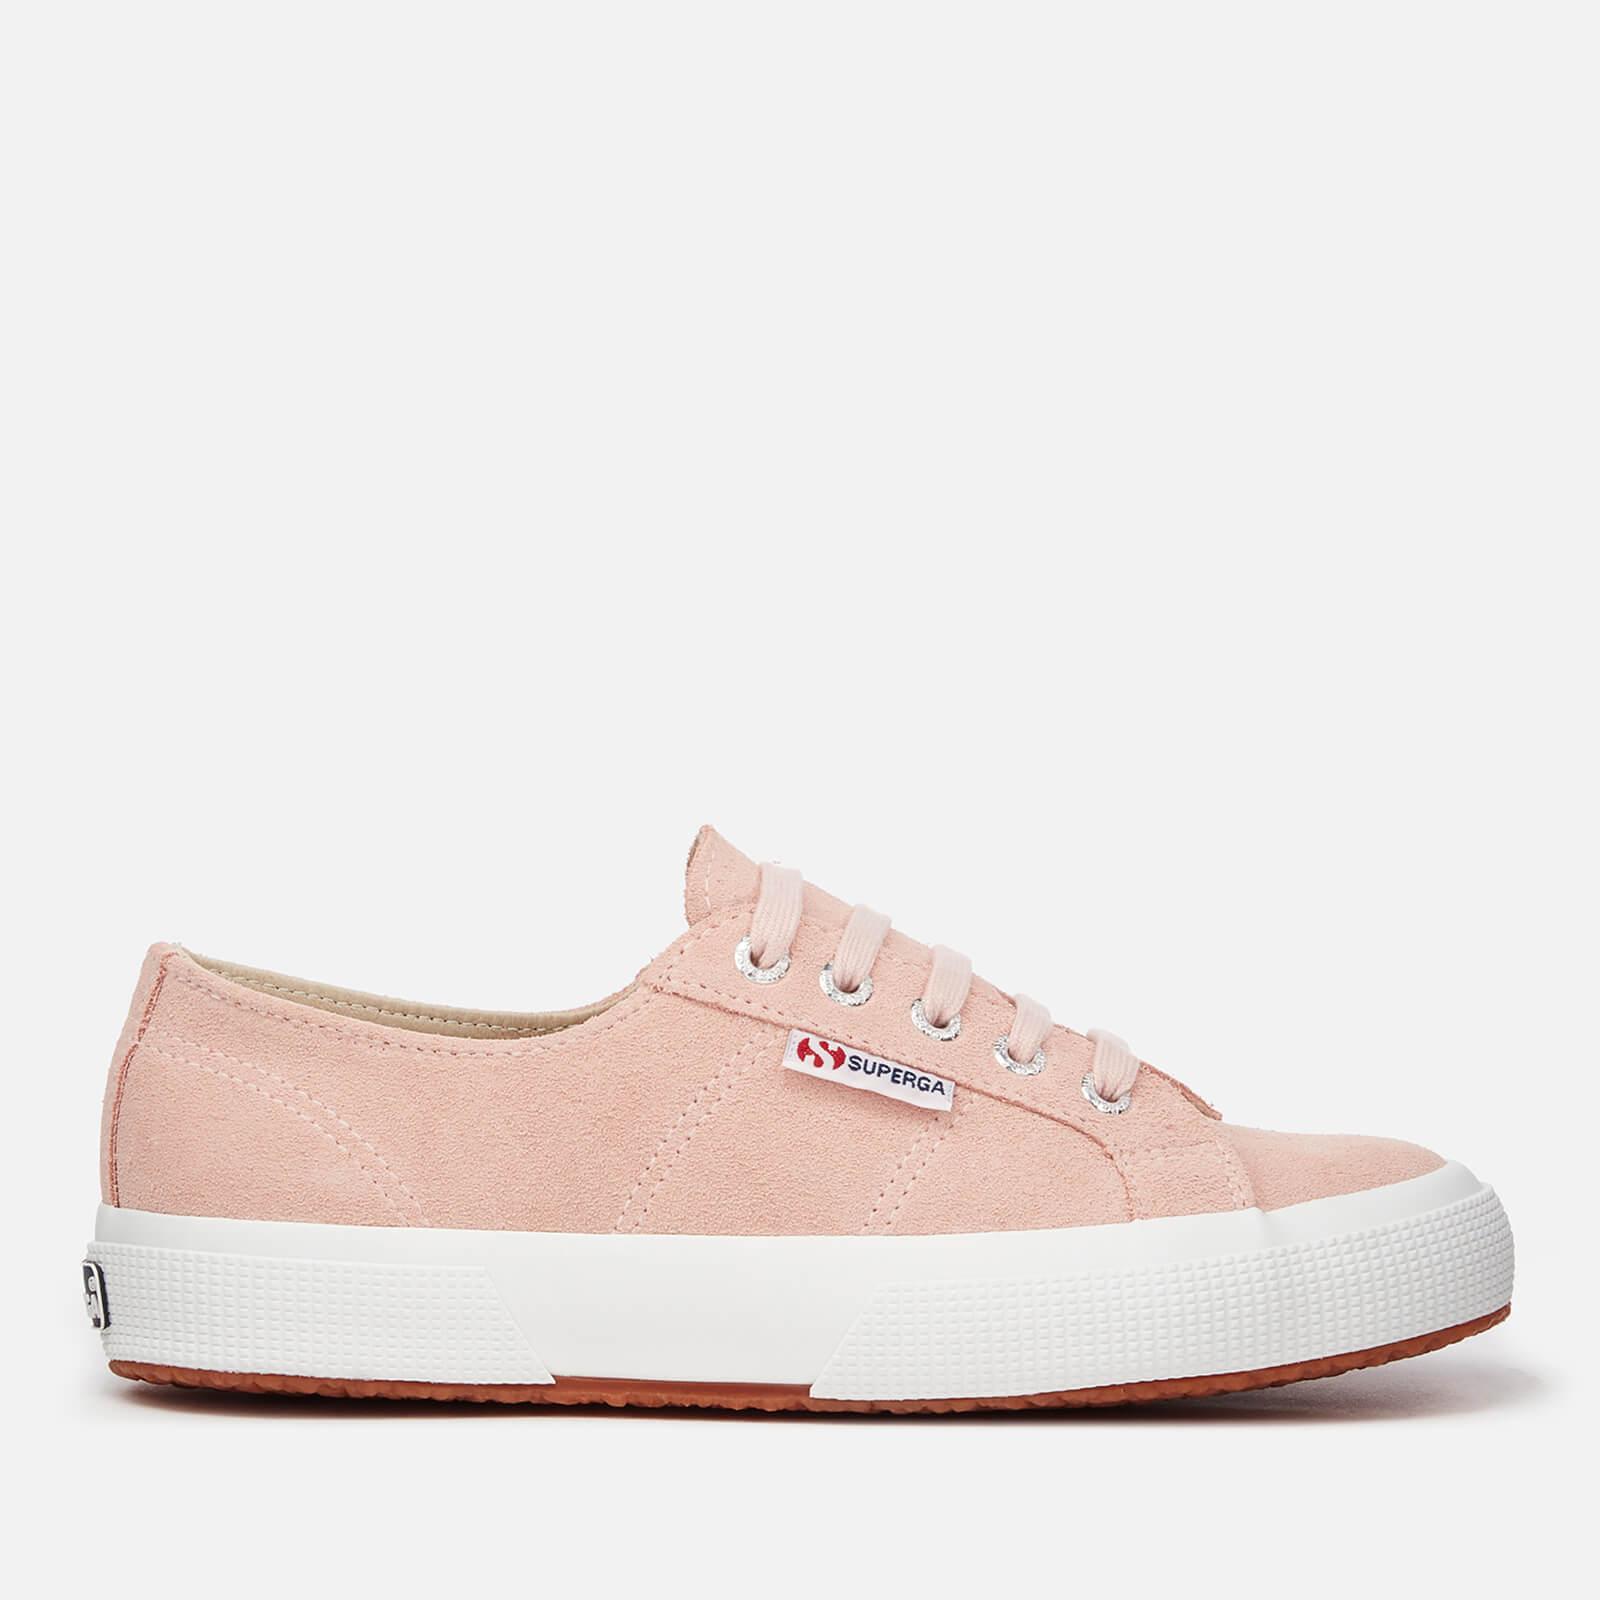 014a1efdb58 Superga Women s 2750 Sueu Trainers - Pink Skin Womens Footwear ...